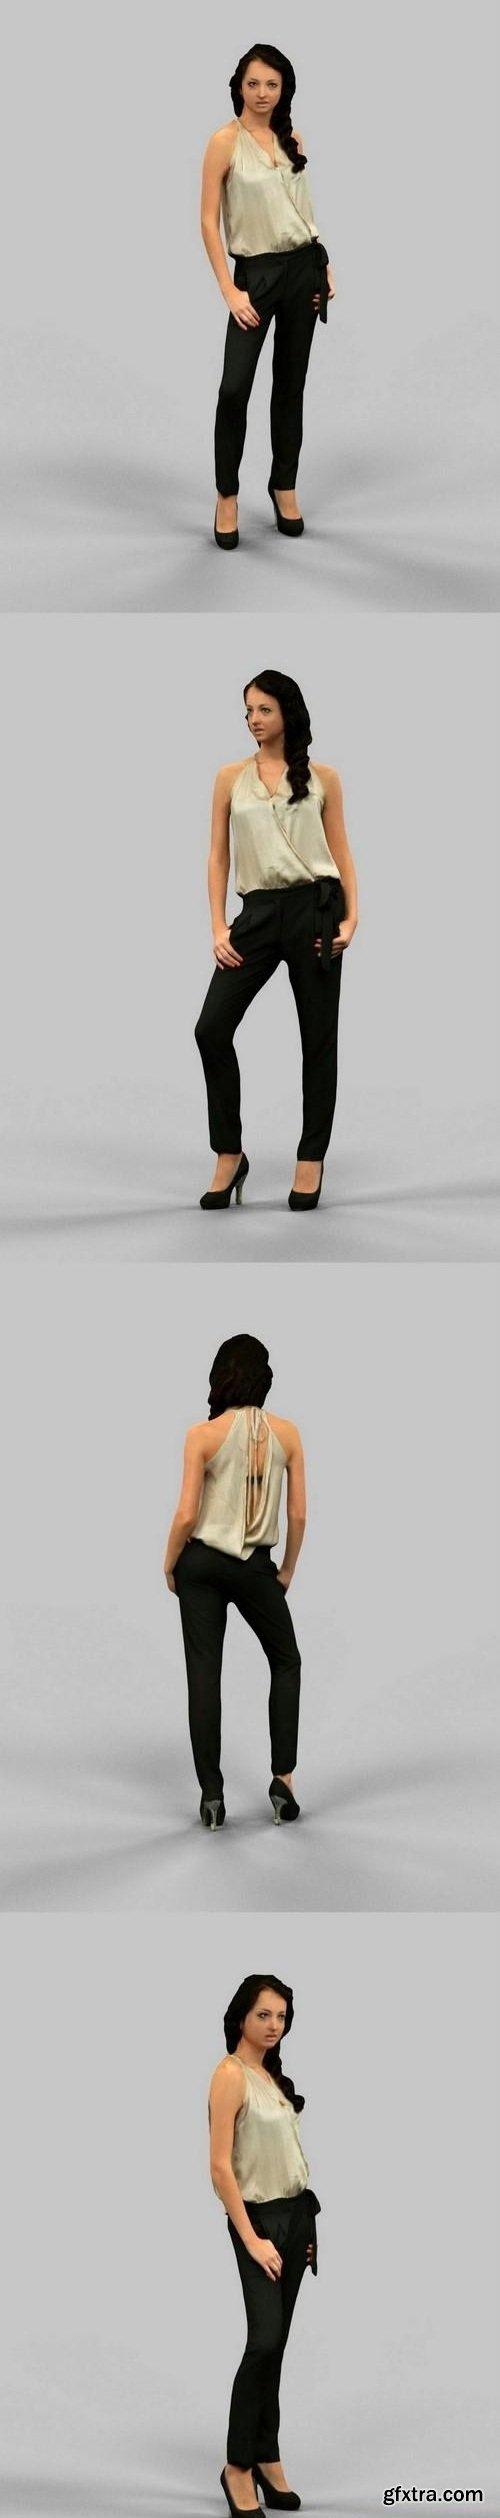 Girl in Black Pants and Golden Top 3D model